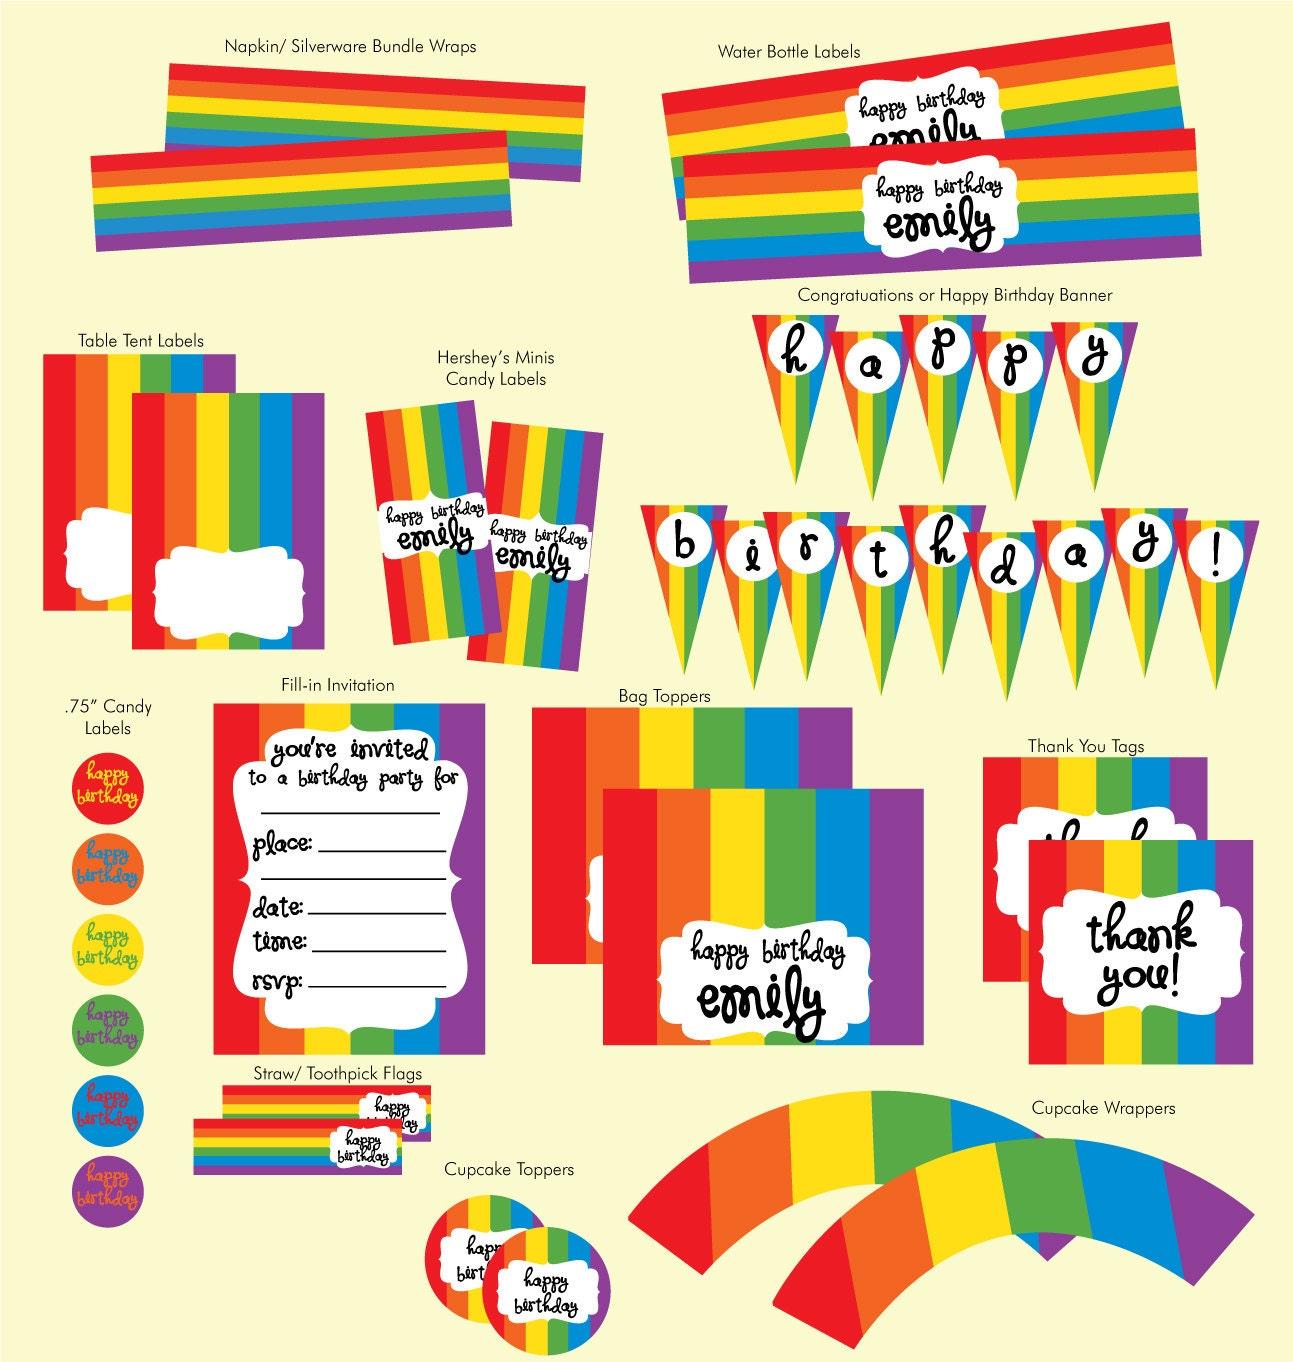 Rainbow Wedding Invitations for adorable invitations design